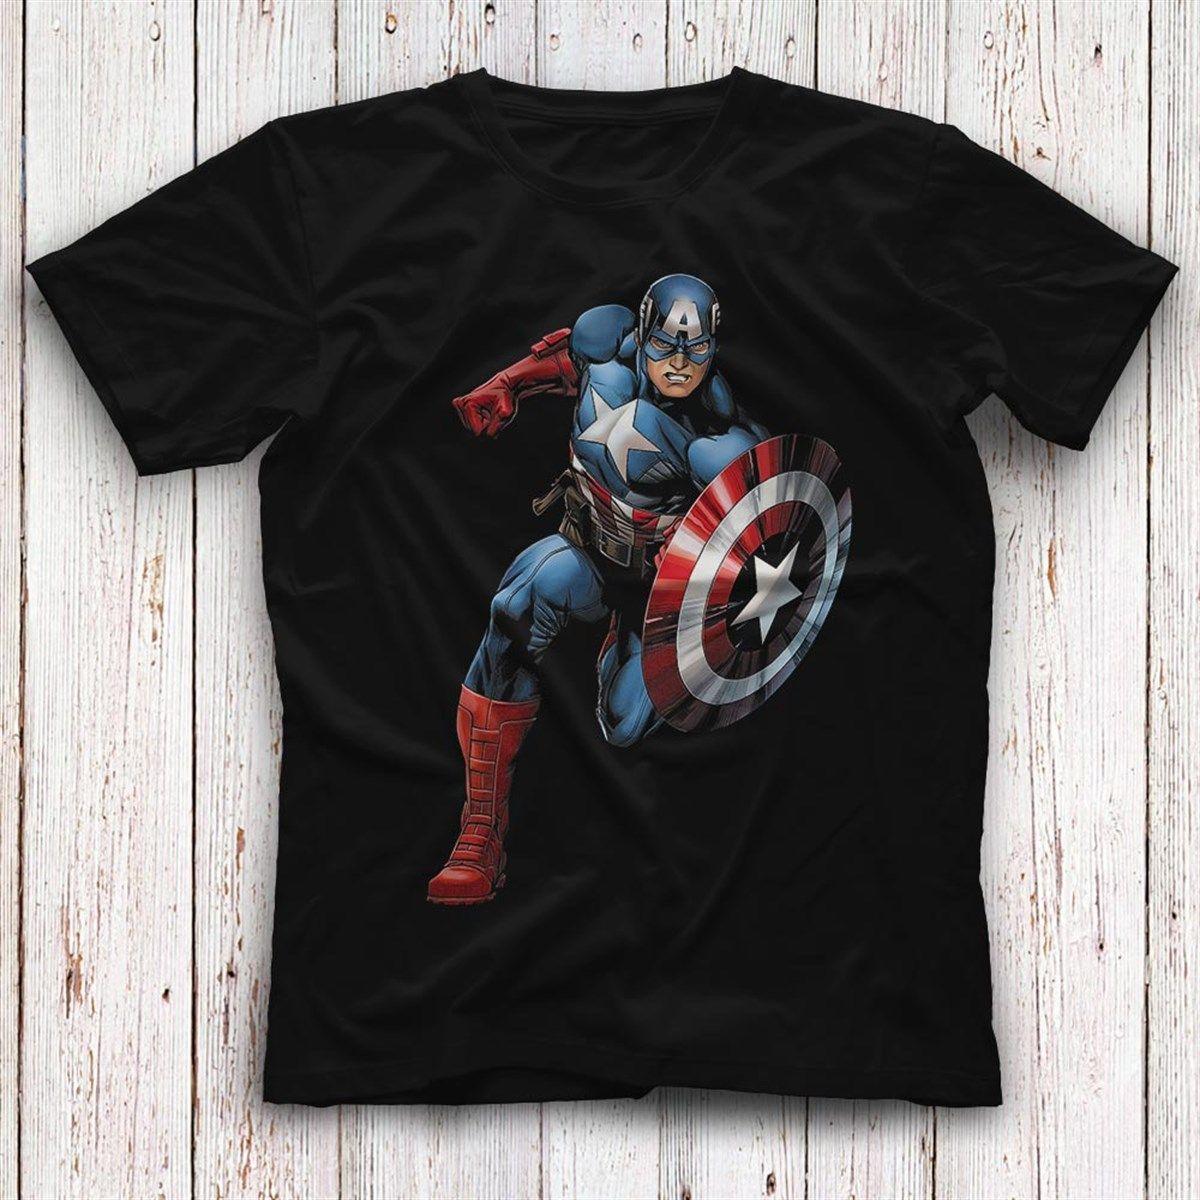 f4848d48 Captain America Black Unisex T-Shirt - Tees - Shirts #captainamerica ...